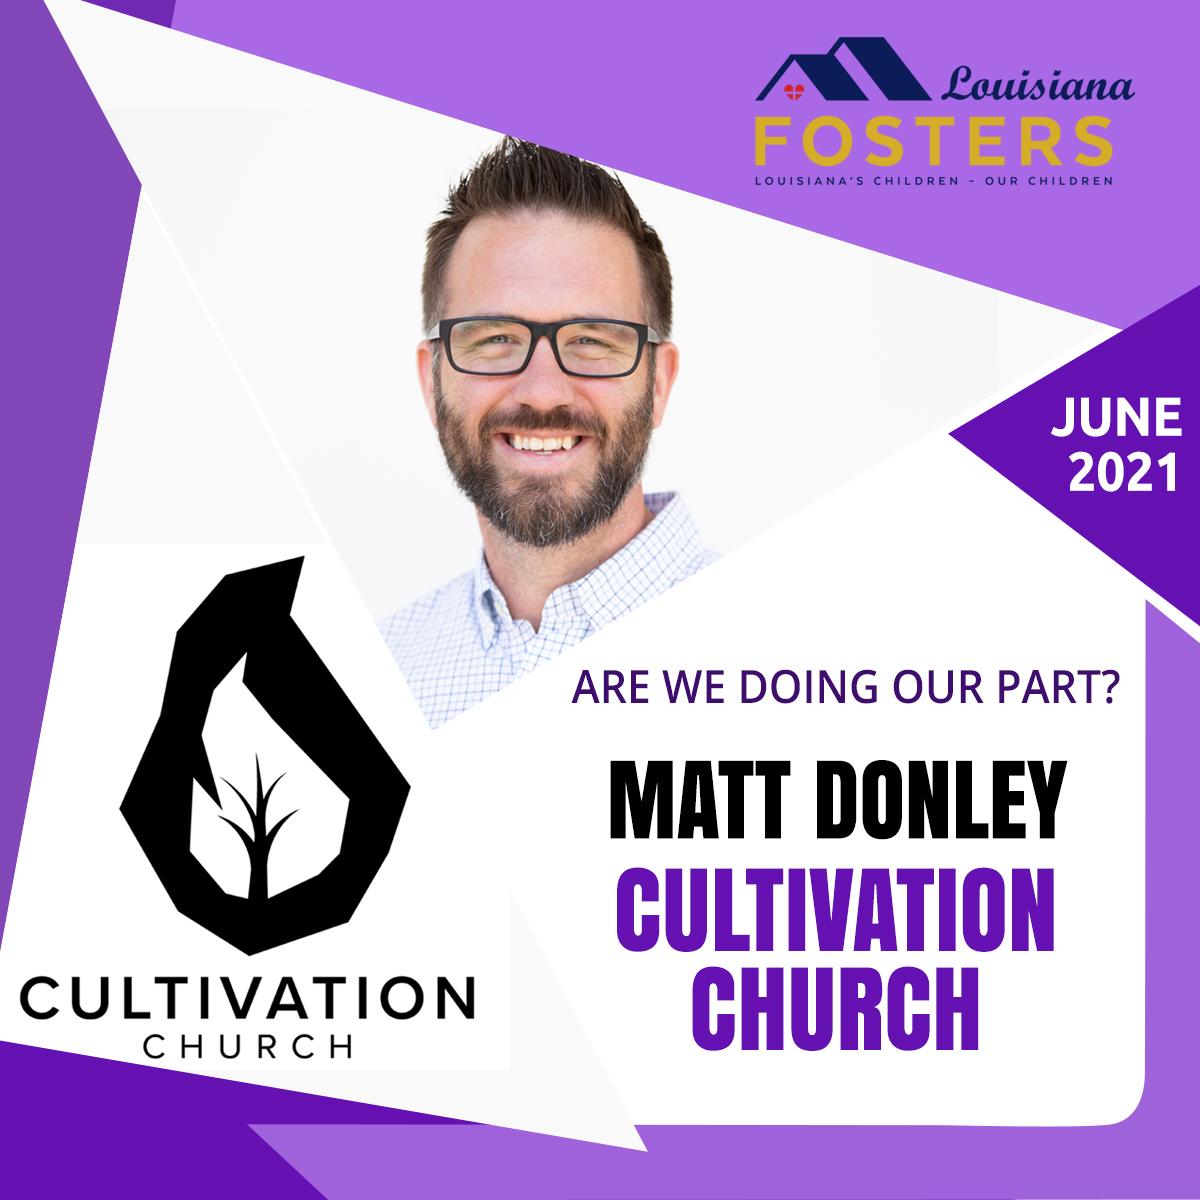 Louisiana Fosters – Cultivation Church